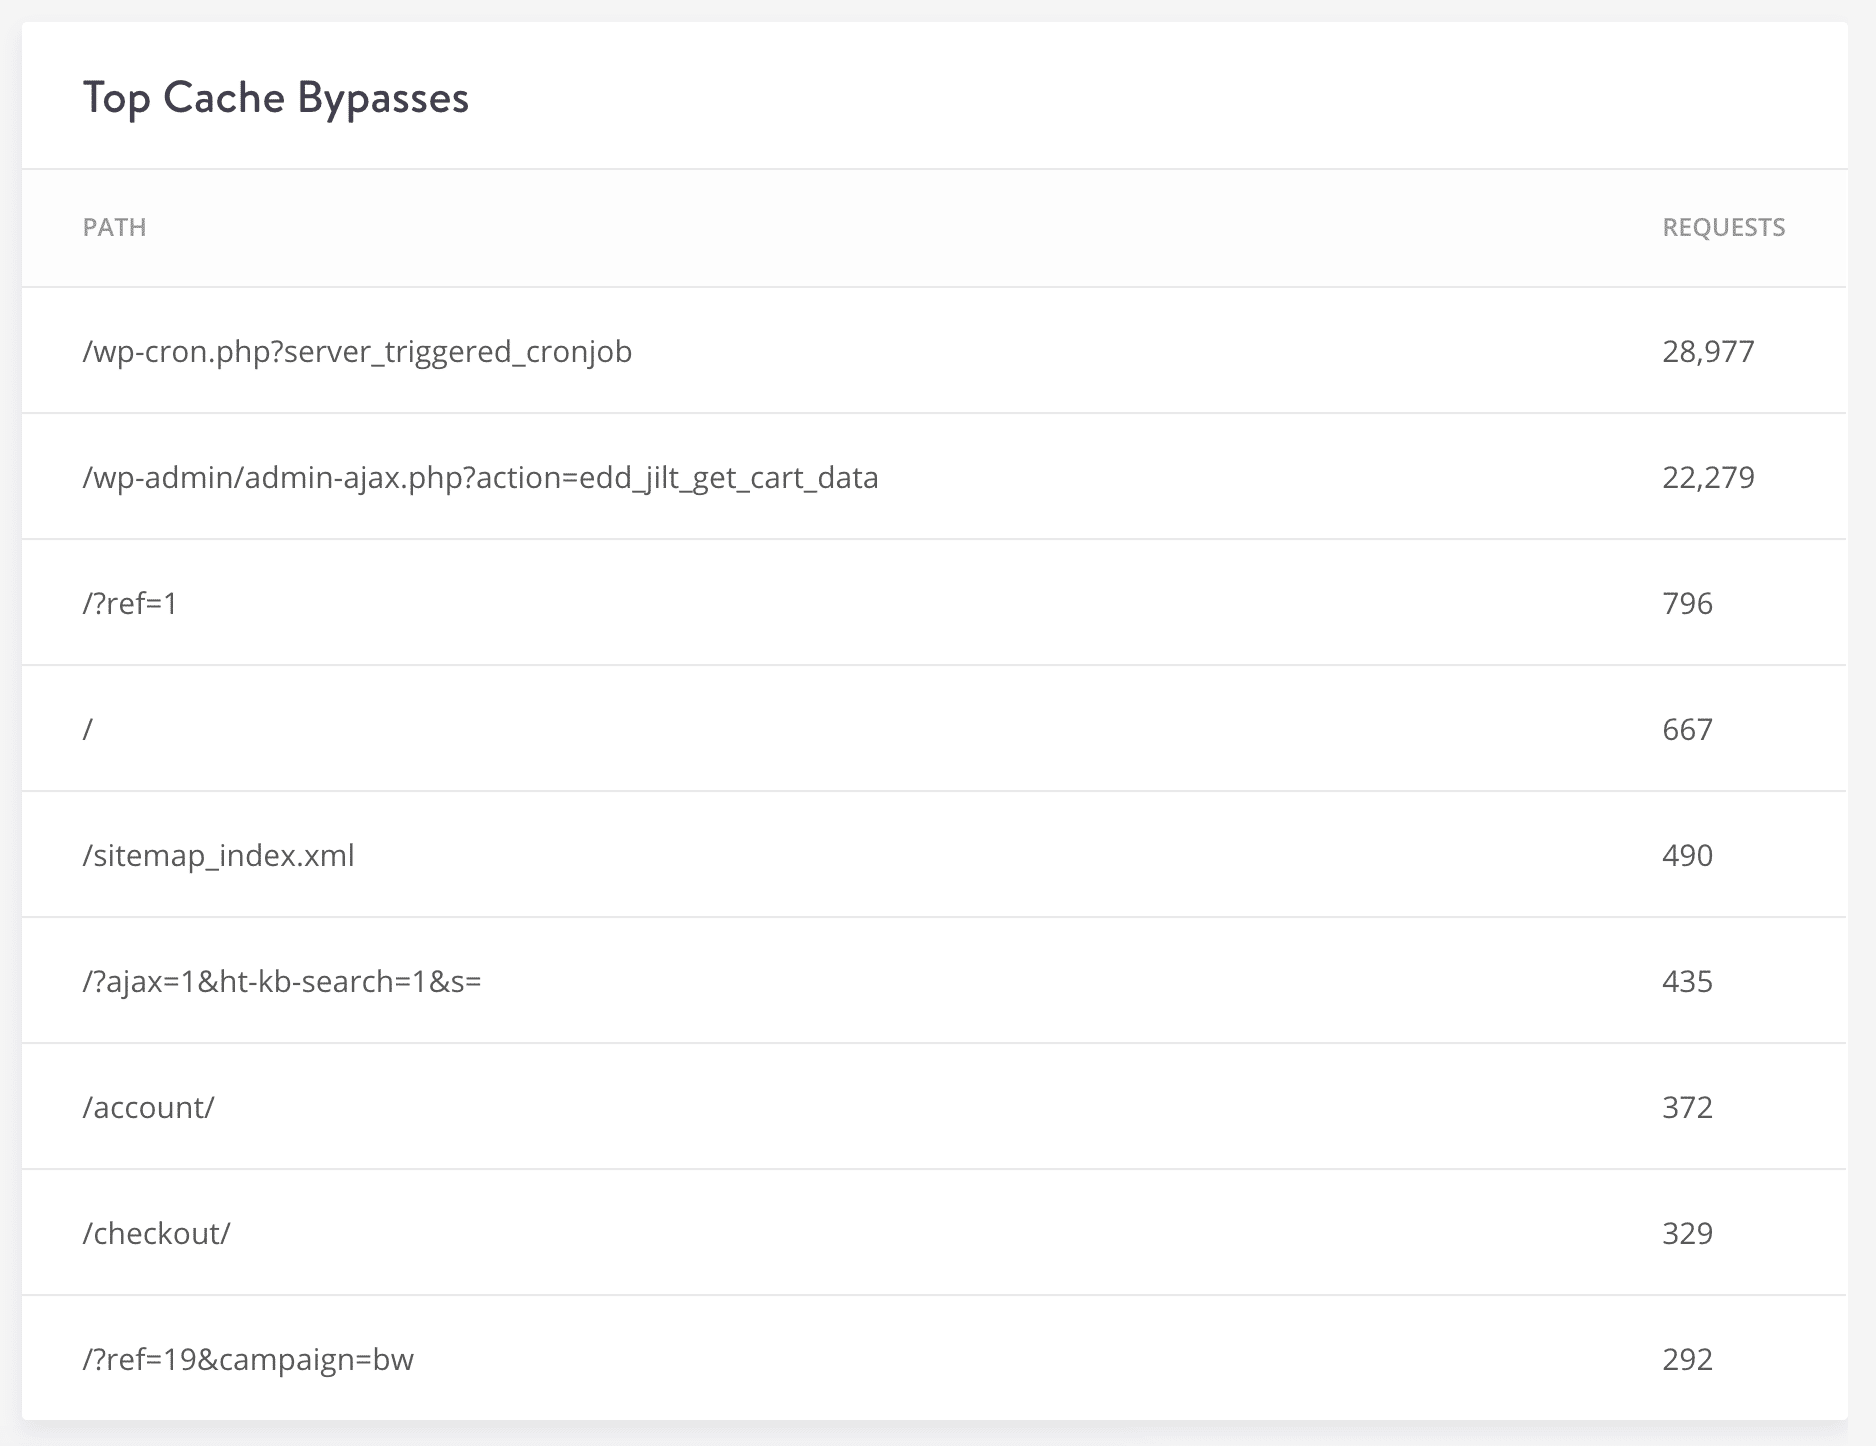 WordPress vanligaste cache-bypass